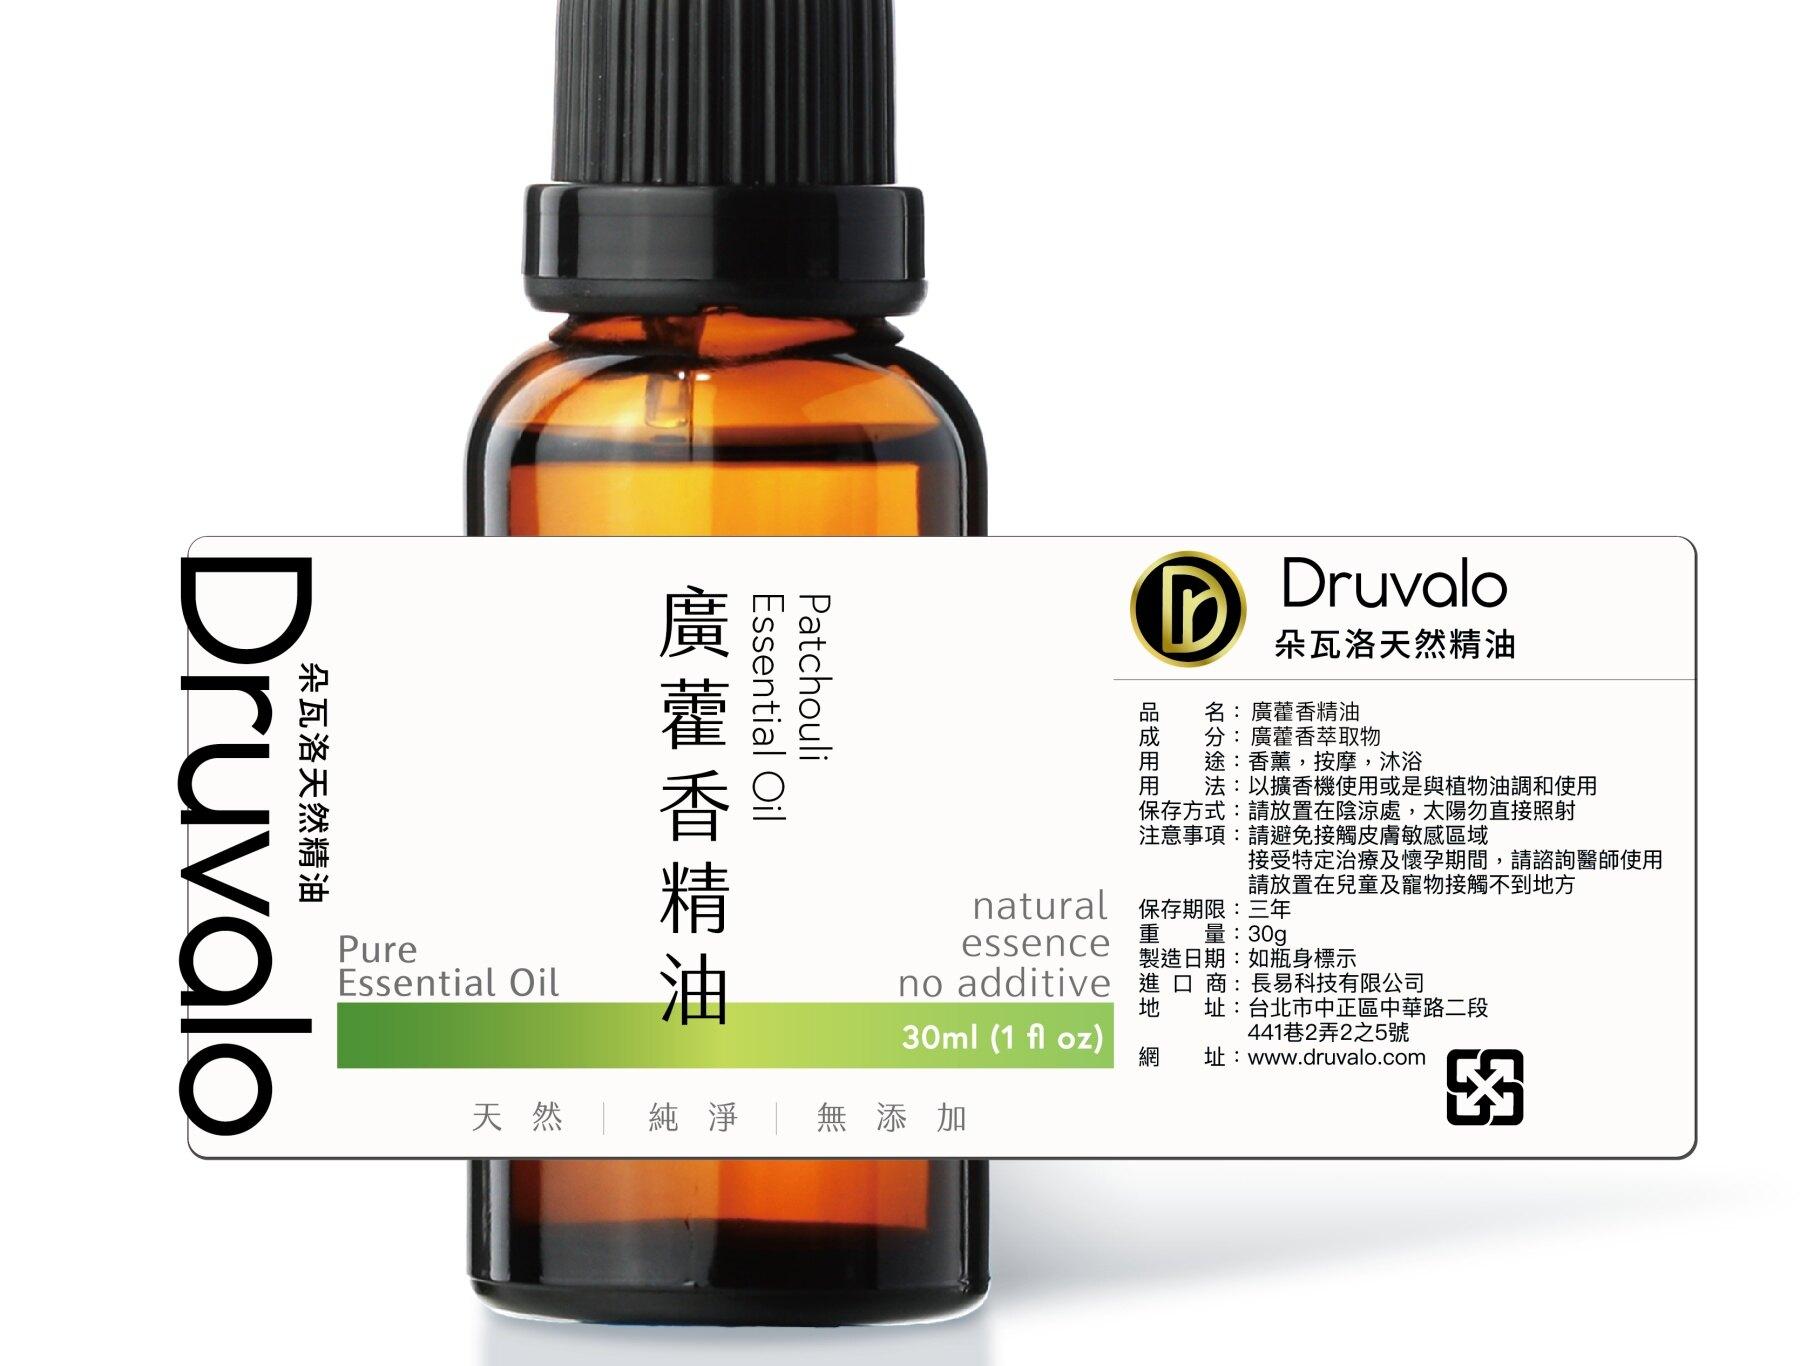 【Druvalo 朵瓦洛】美國進口天然精油-廣藿香(30ml)